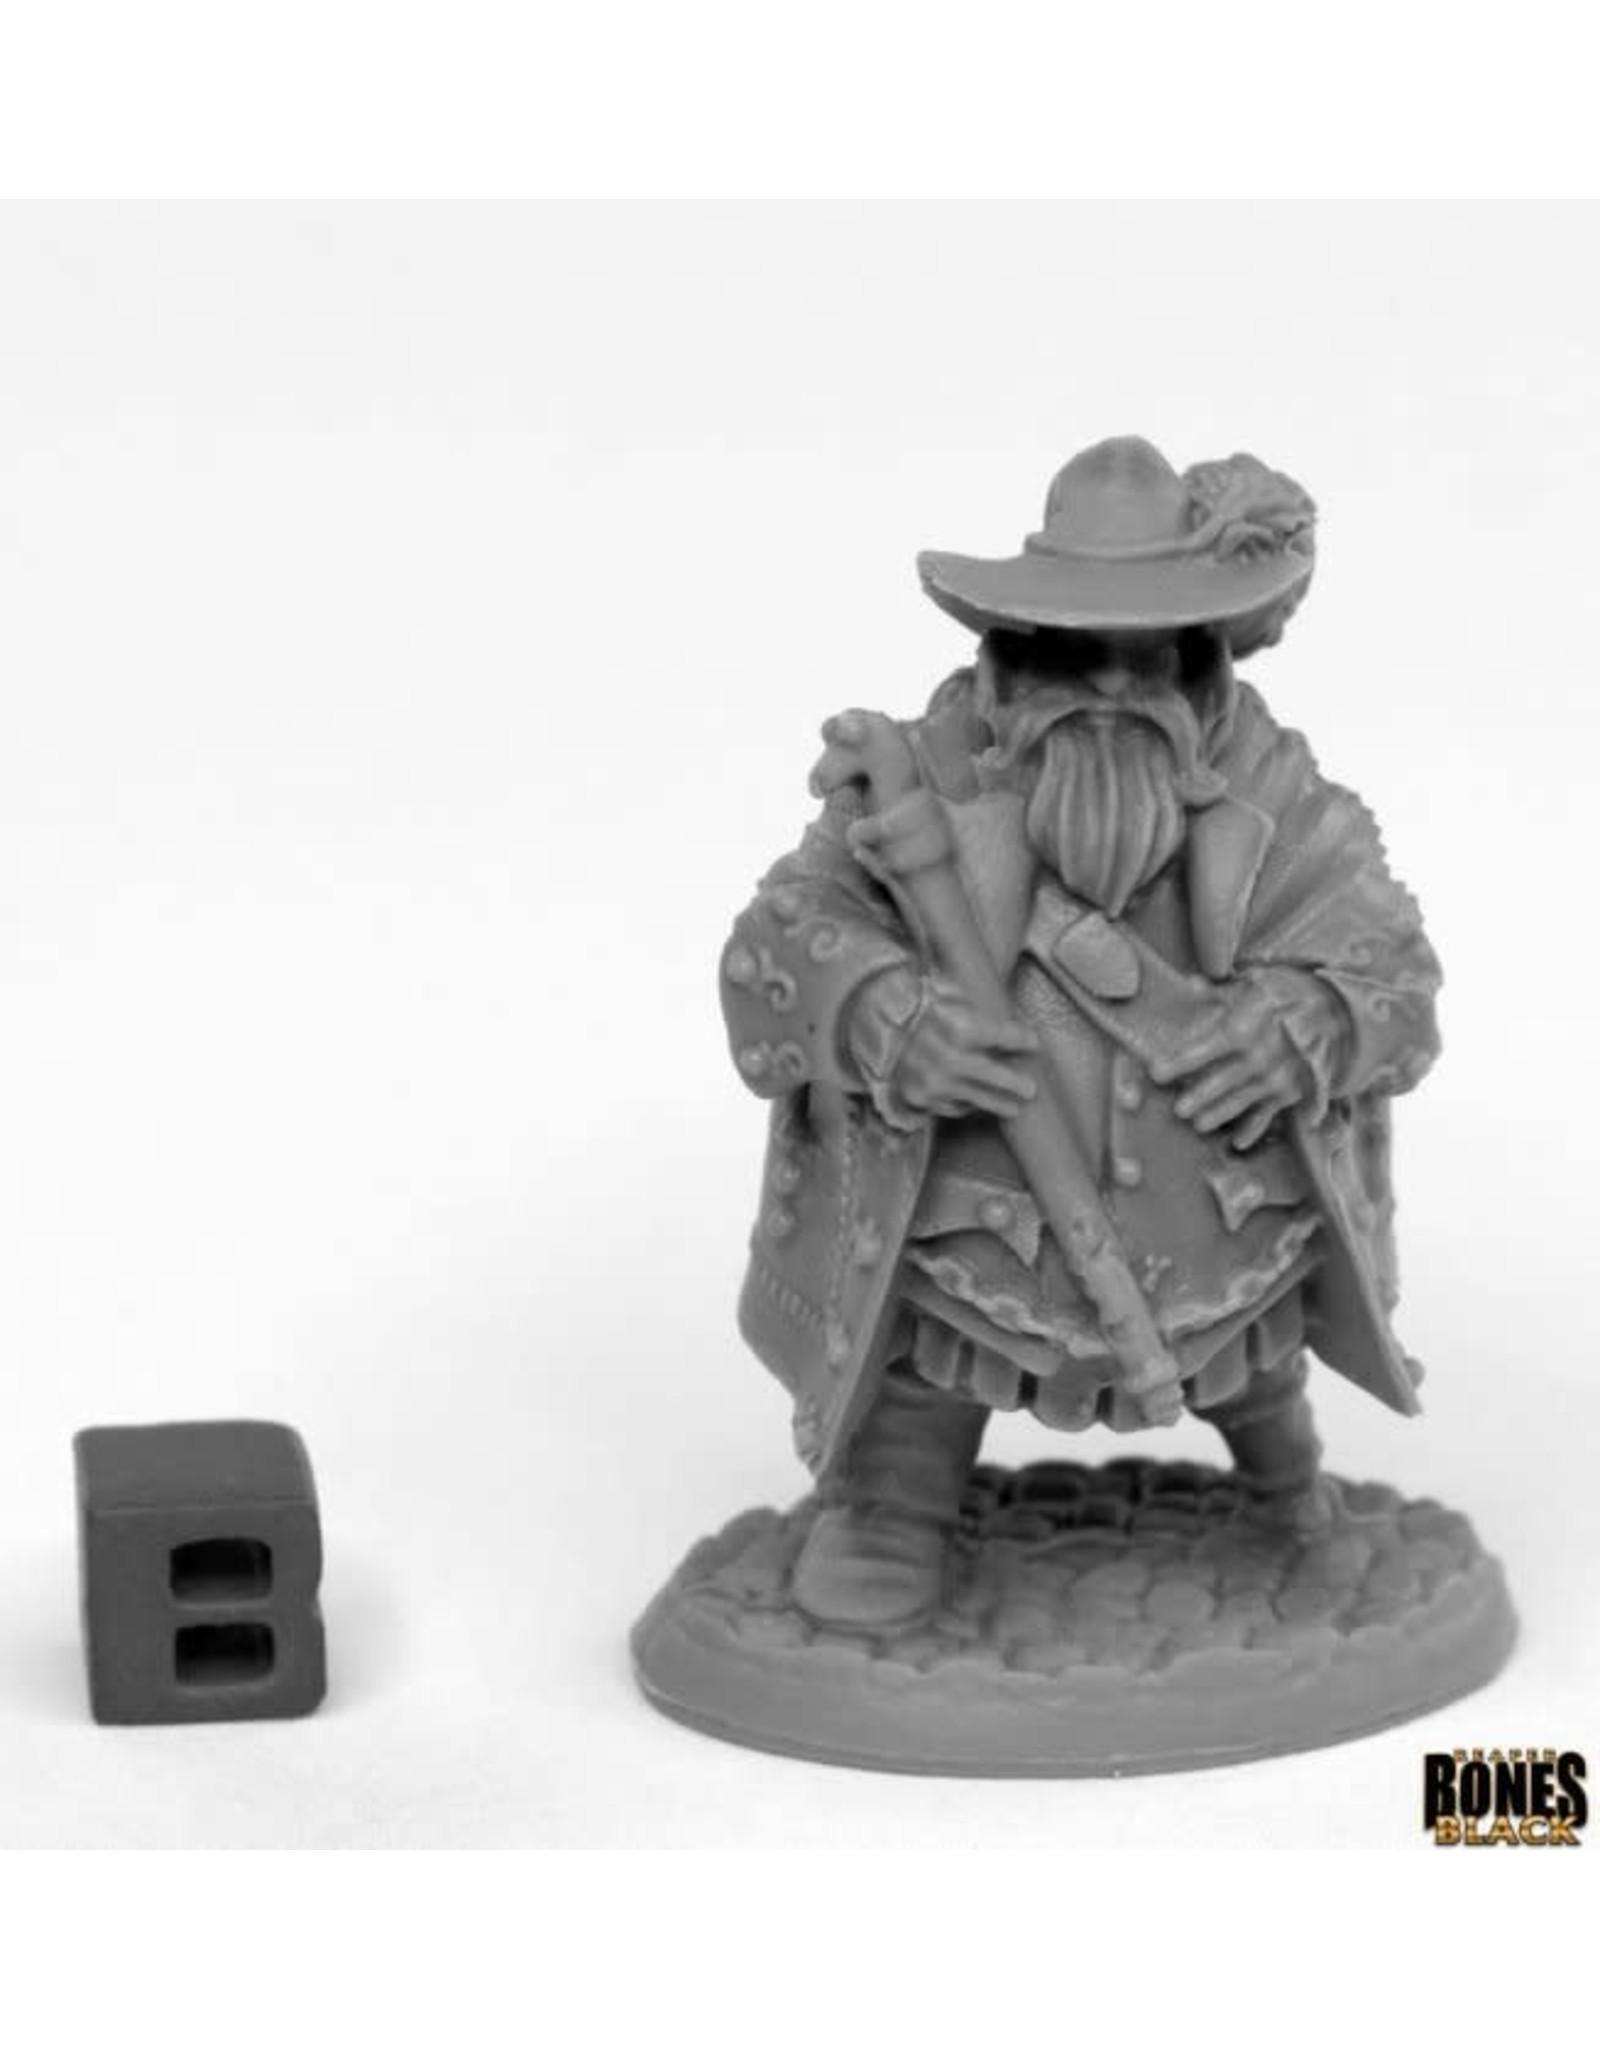 Reaper Miniatures Bones Black: Reeve Planomap